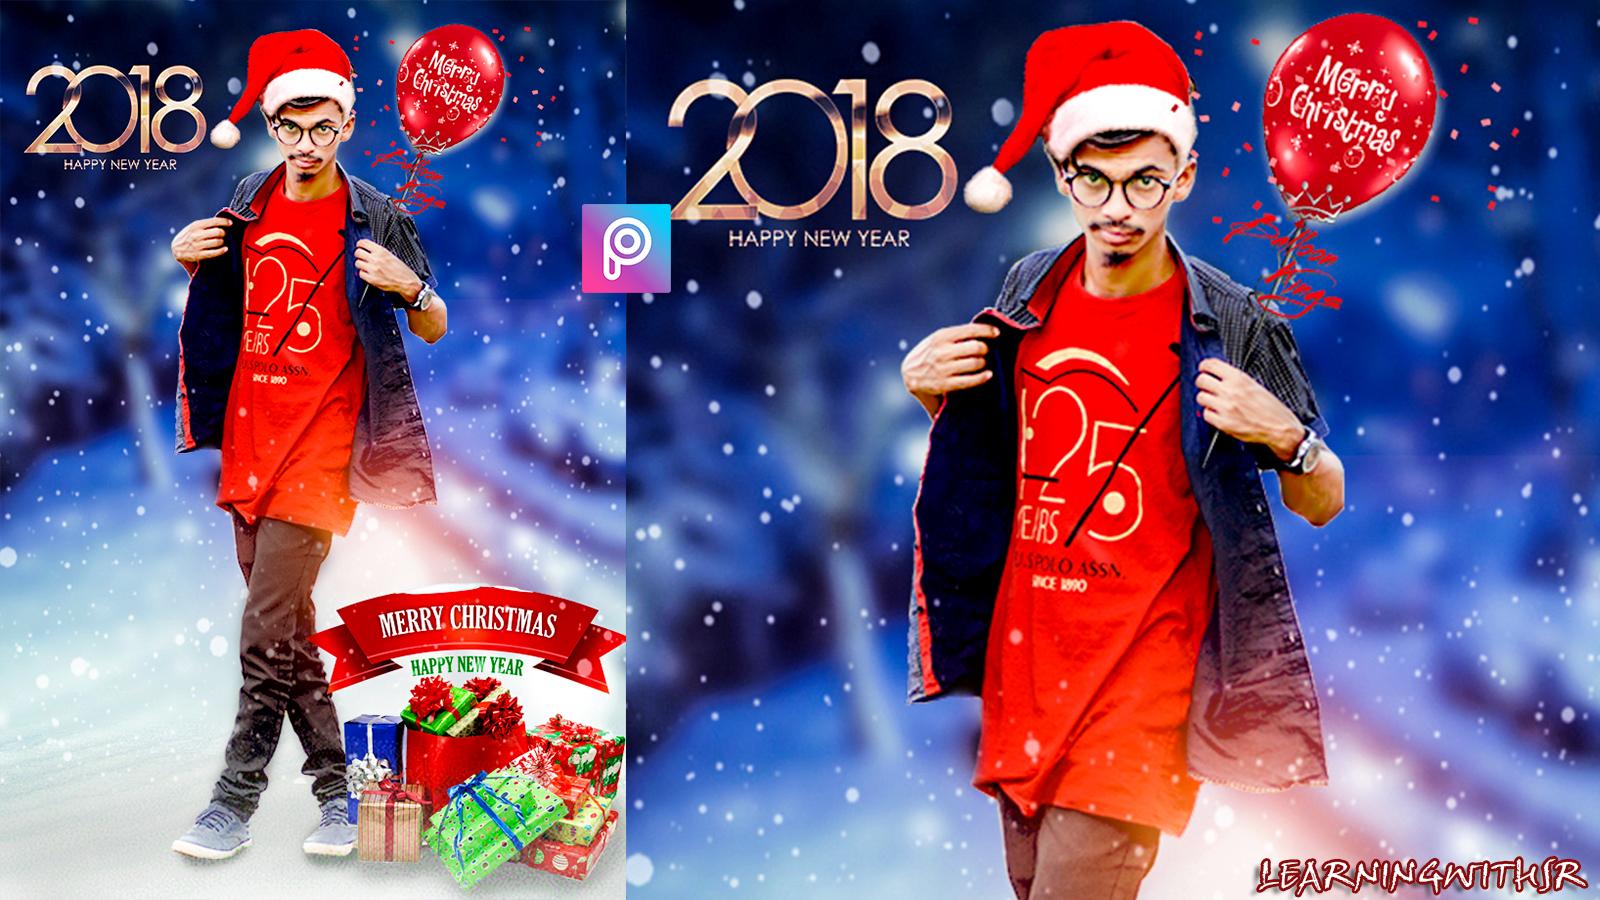 merry christmas picsart editing tutorial 2018 christmas special photo editing tutorial bg png